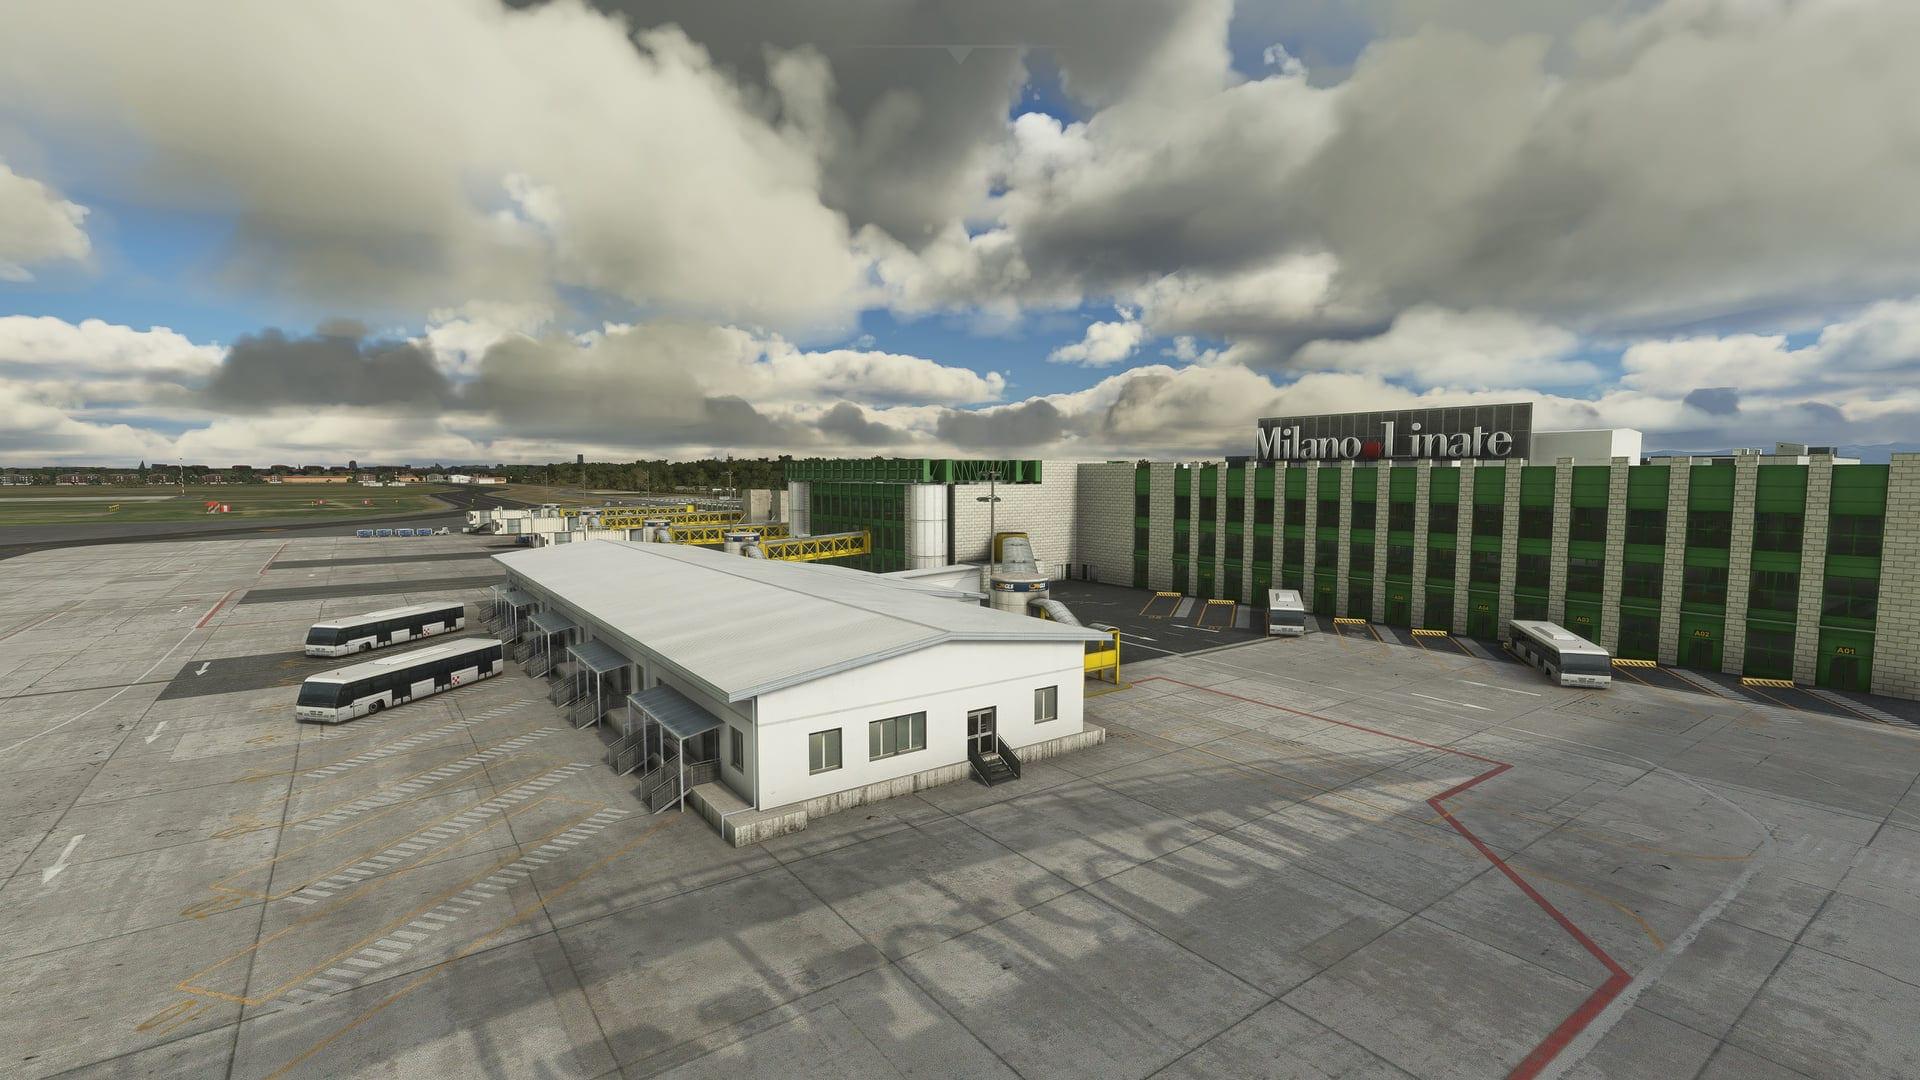 Microsoft Flight Simulator Linate